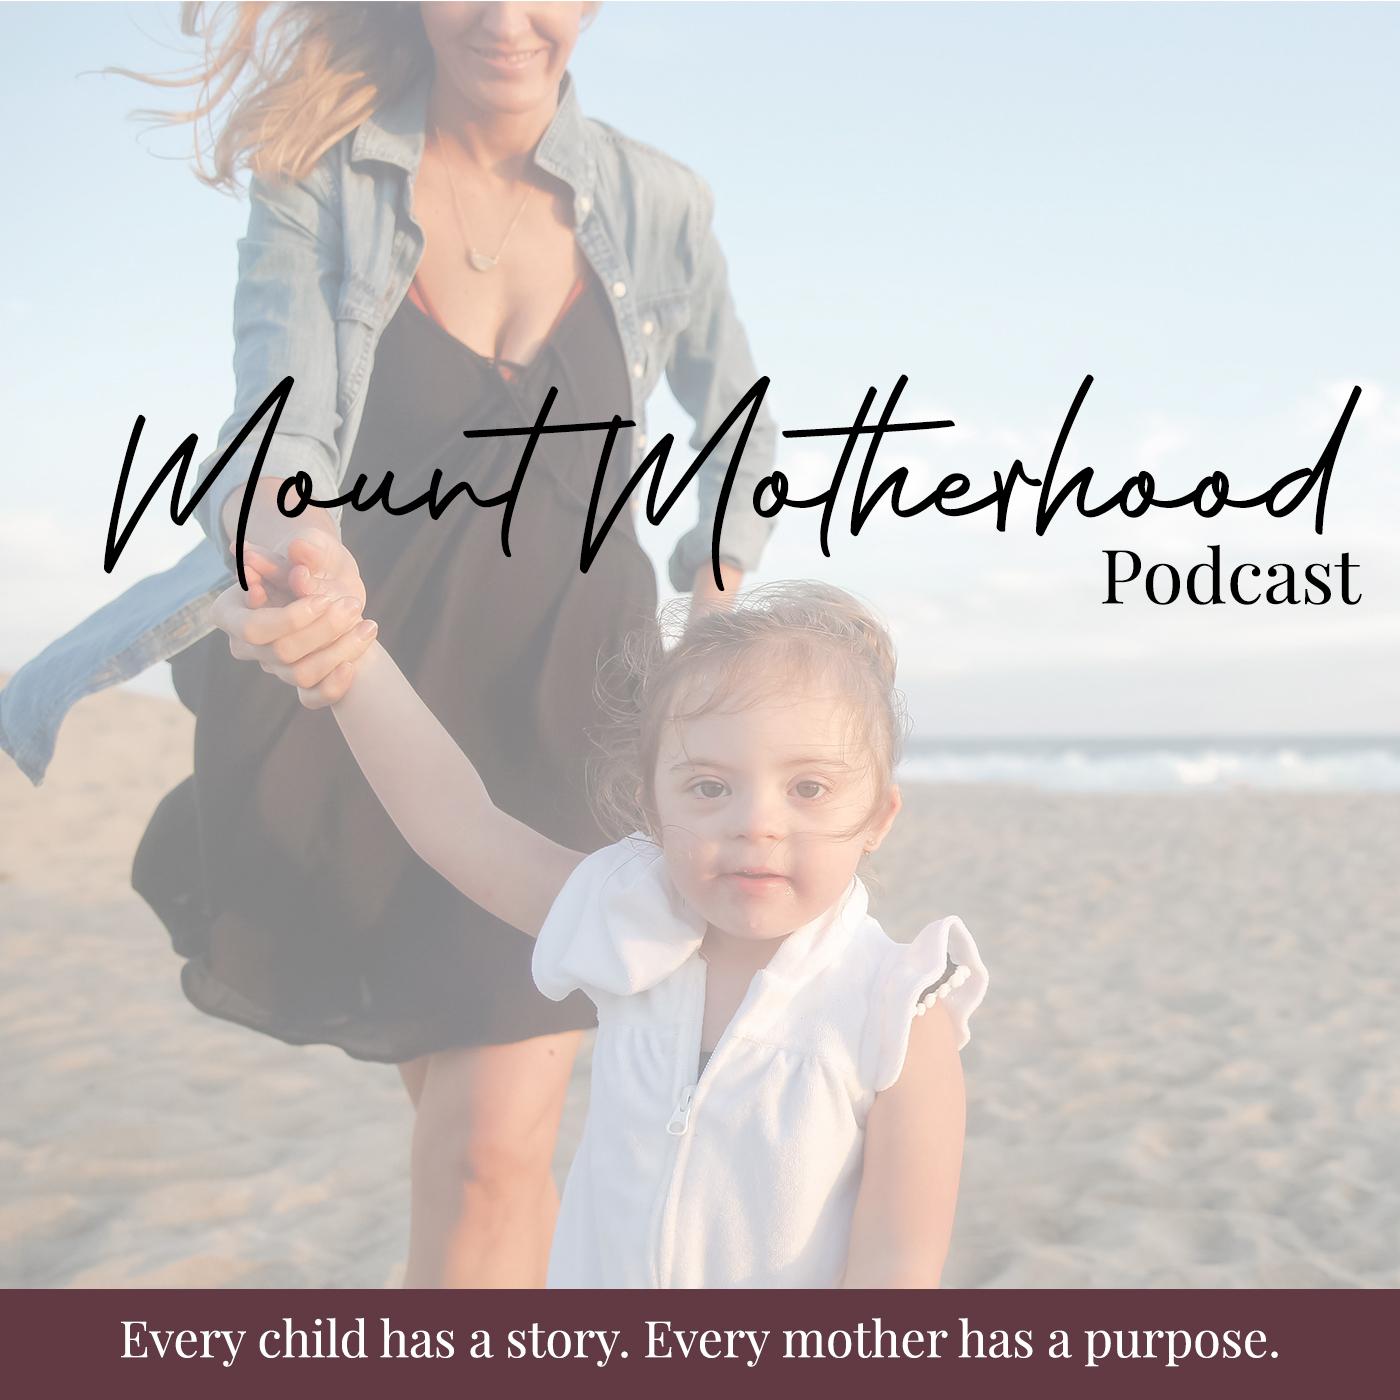 Mount Motherhood Podcast show art